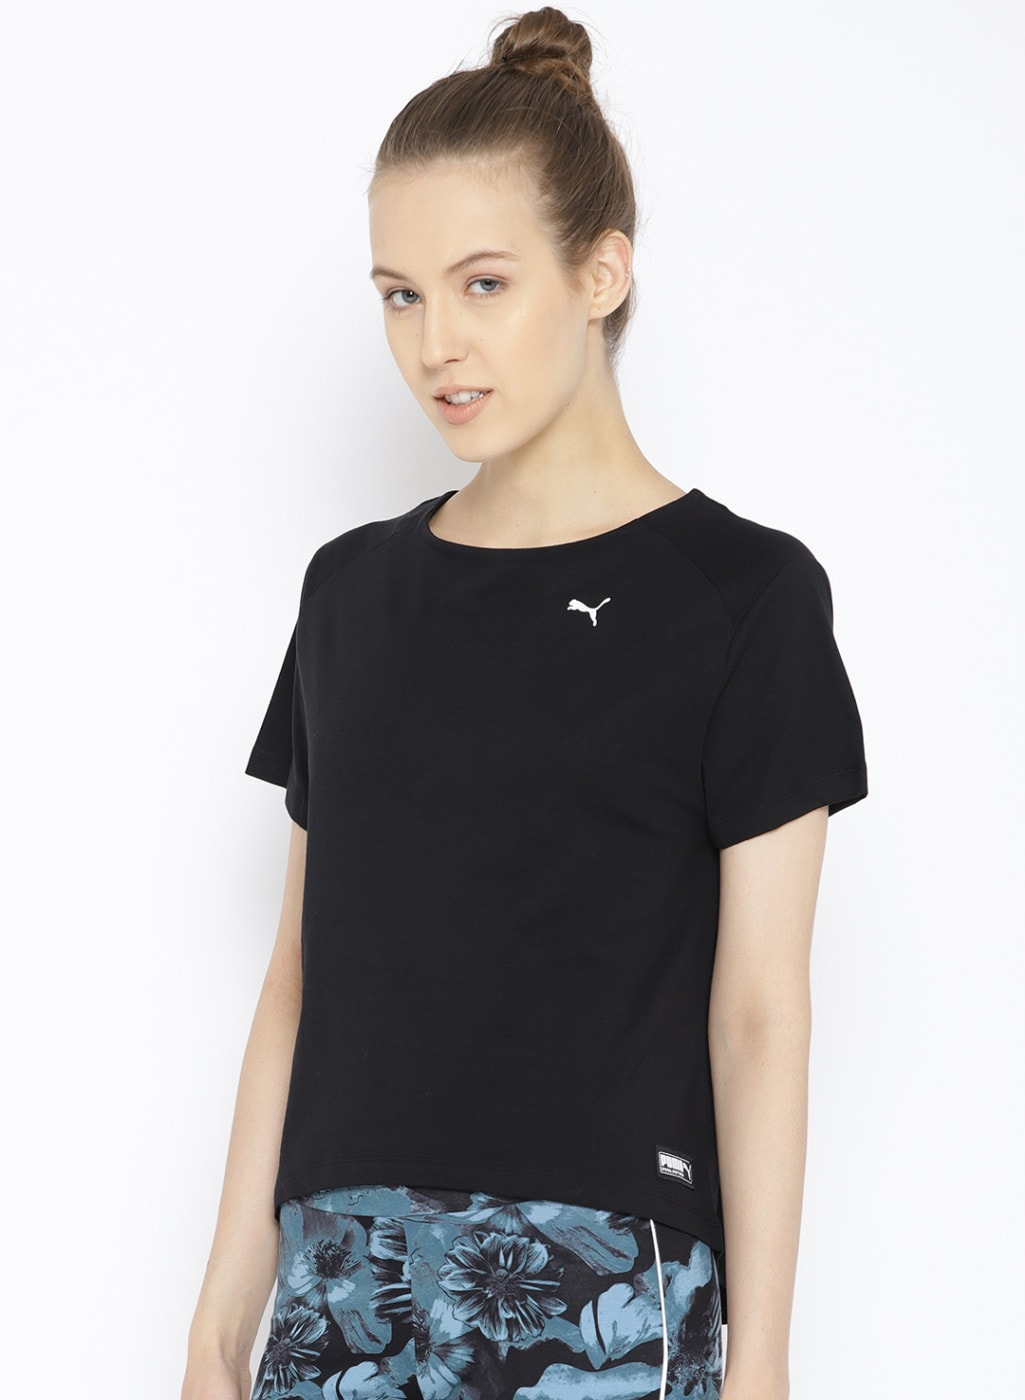 f13ef430317 Women Tshirt Puma - Buy Women Tshirt Puma online in India - Jabong